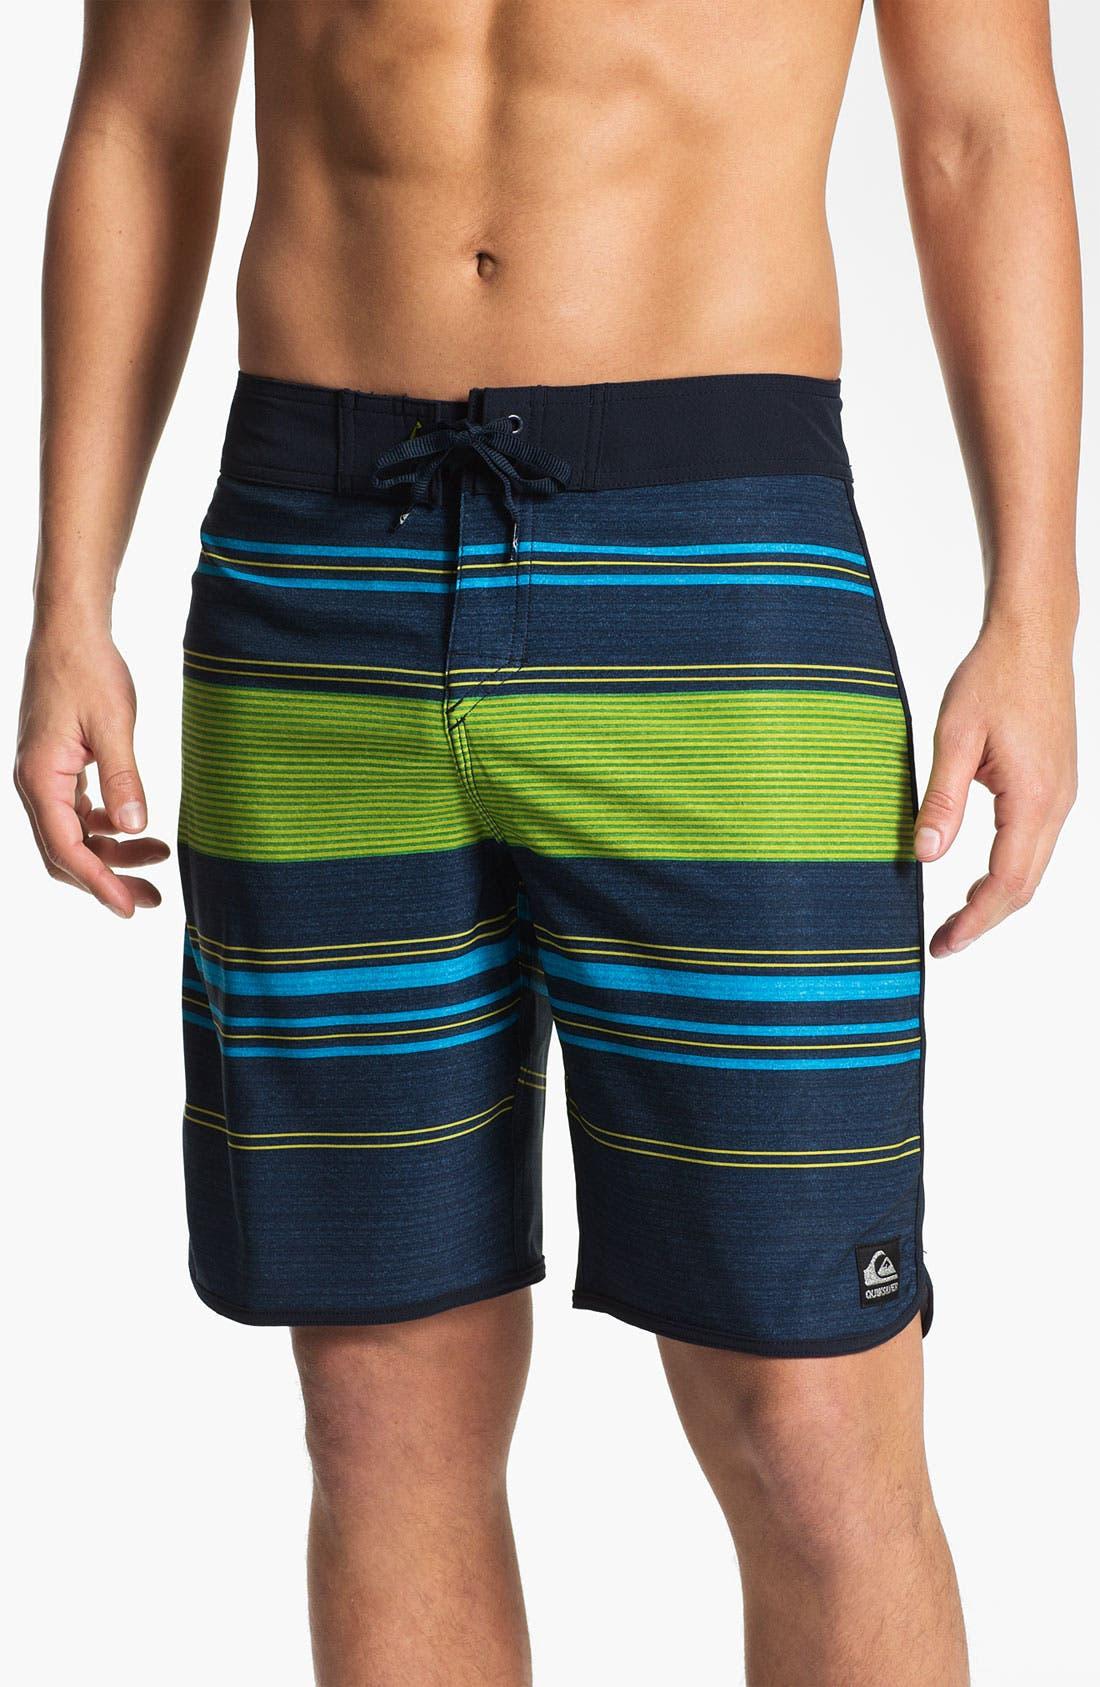 Alternate Image 1 Selected - Quiksilver 'Split It' Board Shorts